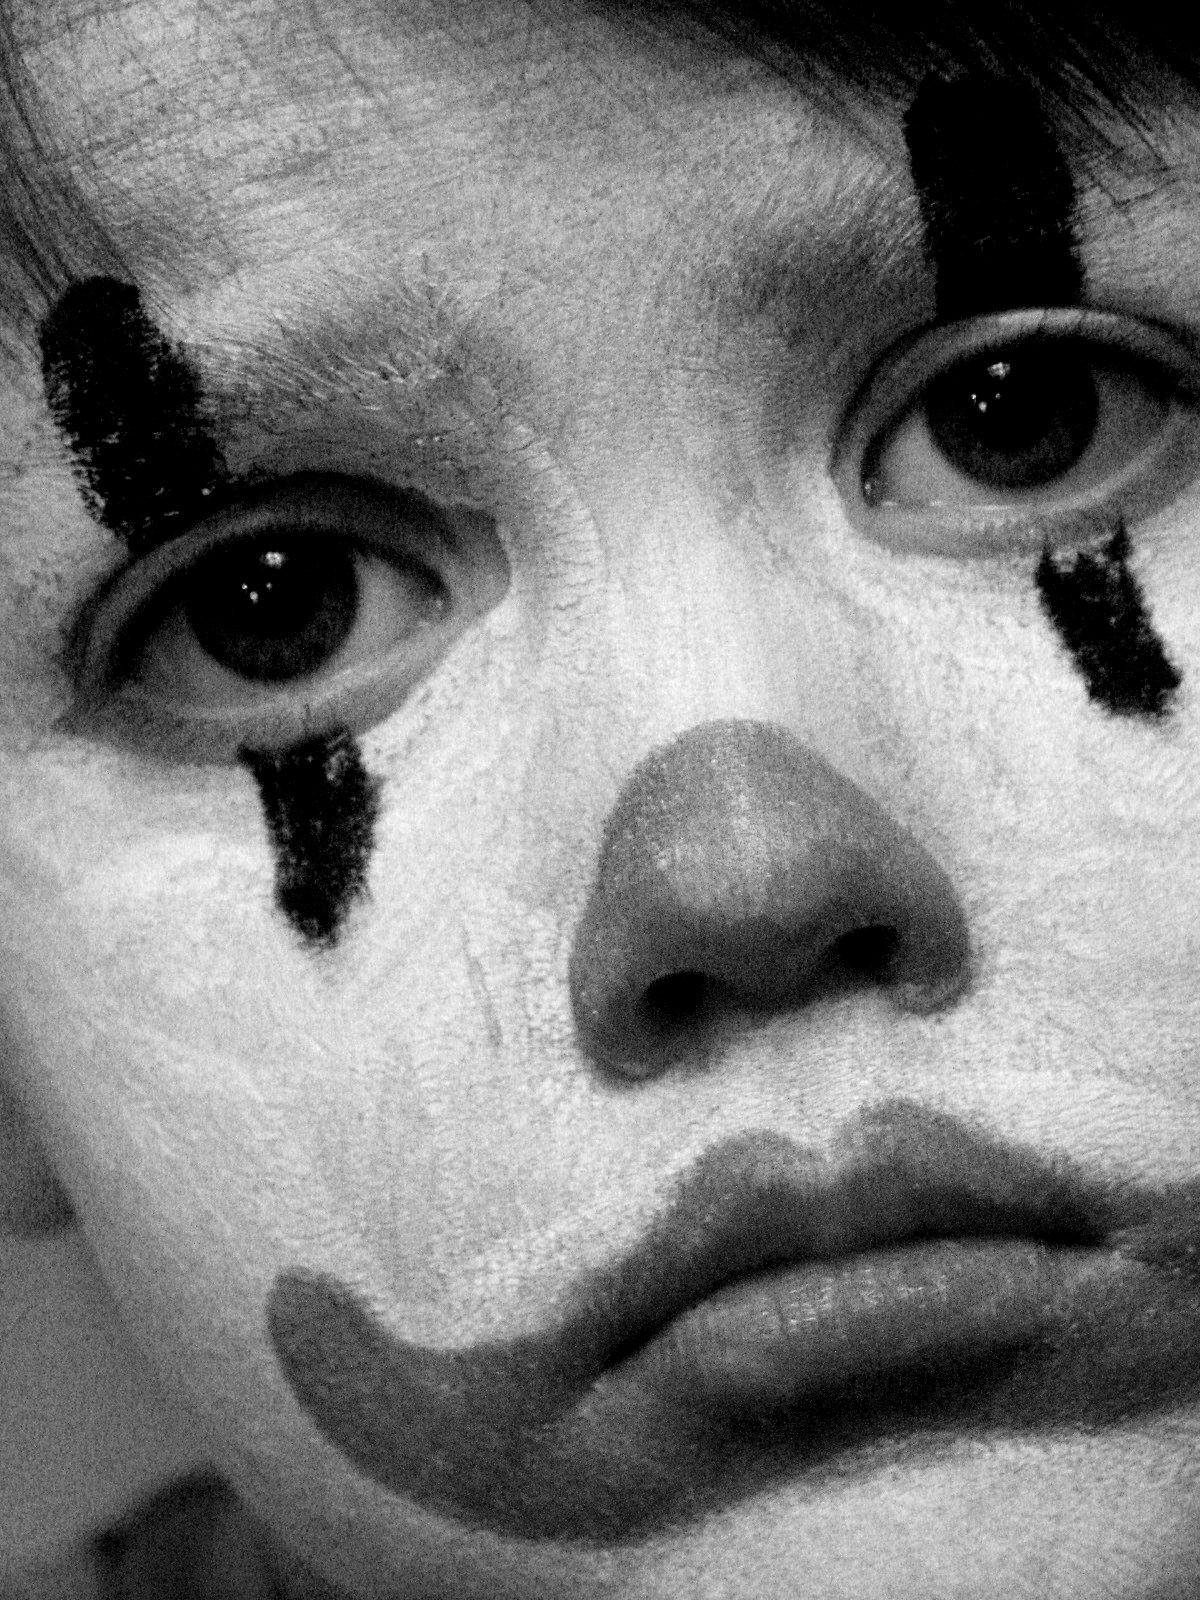 Od suze do osmeha... - Page 9 Sad_Clown_by_pansyredbooties